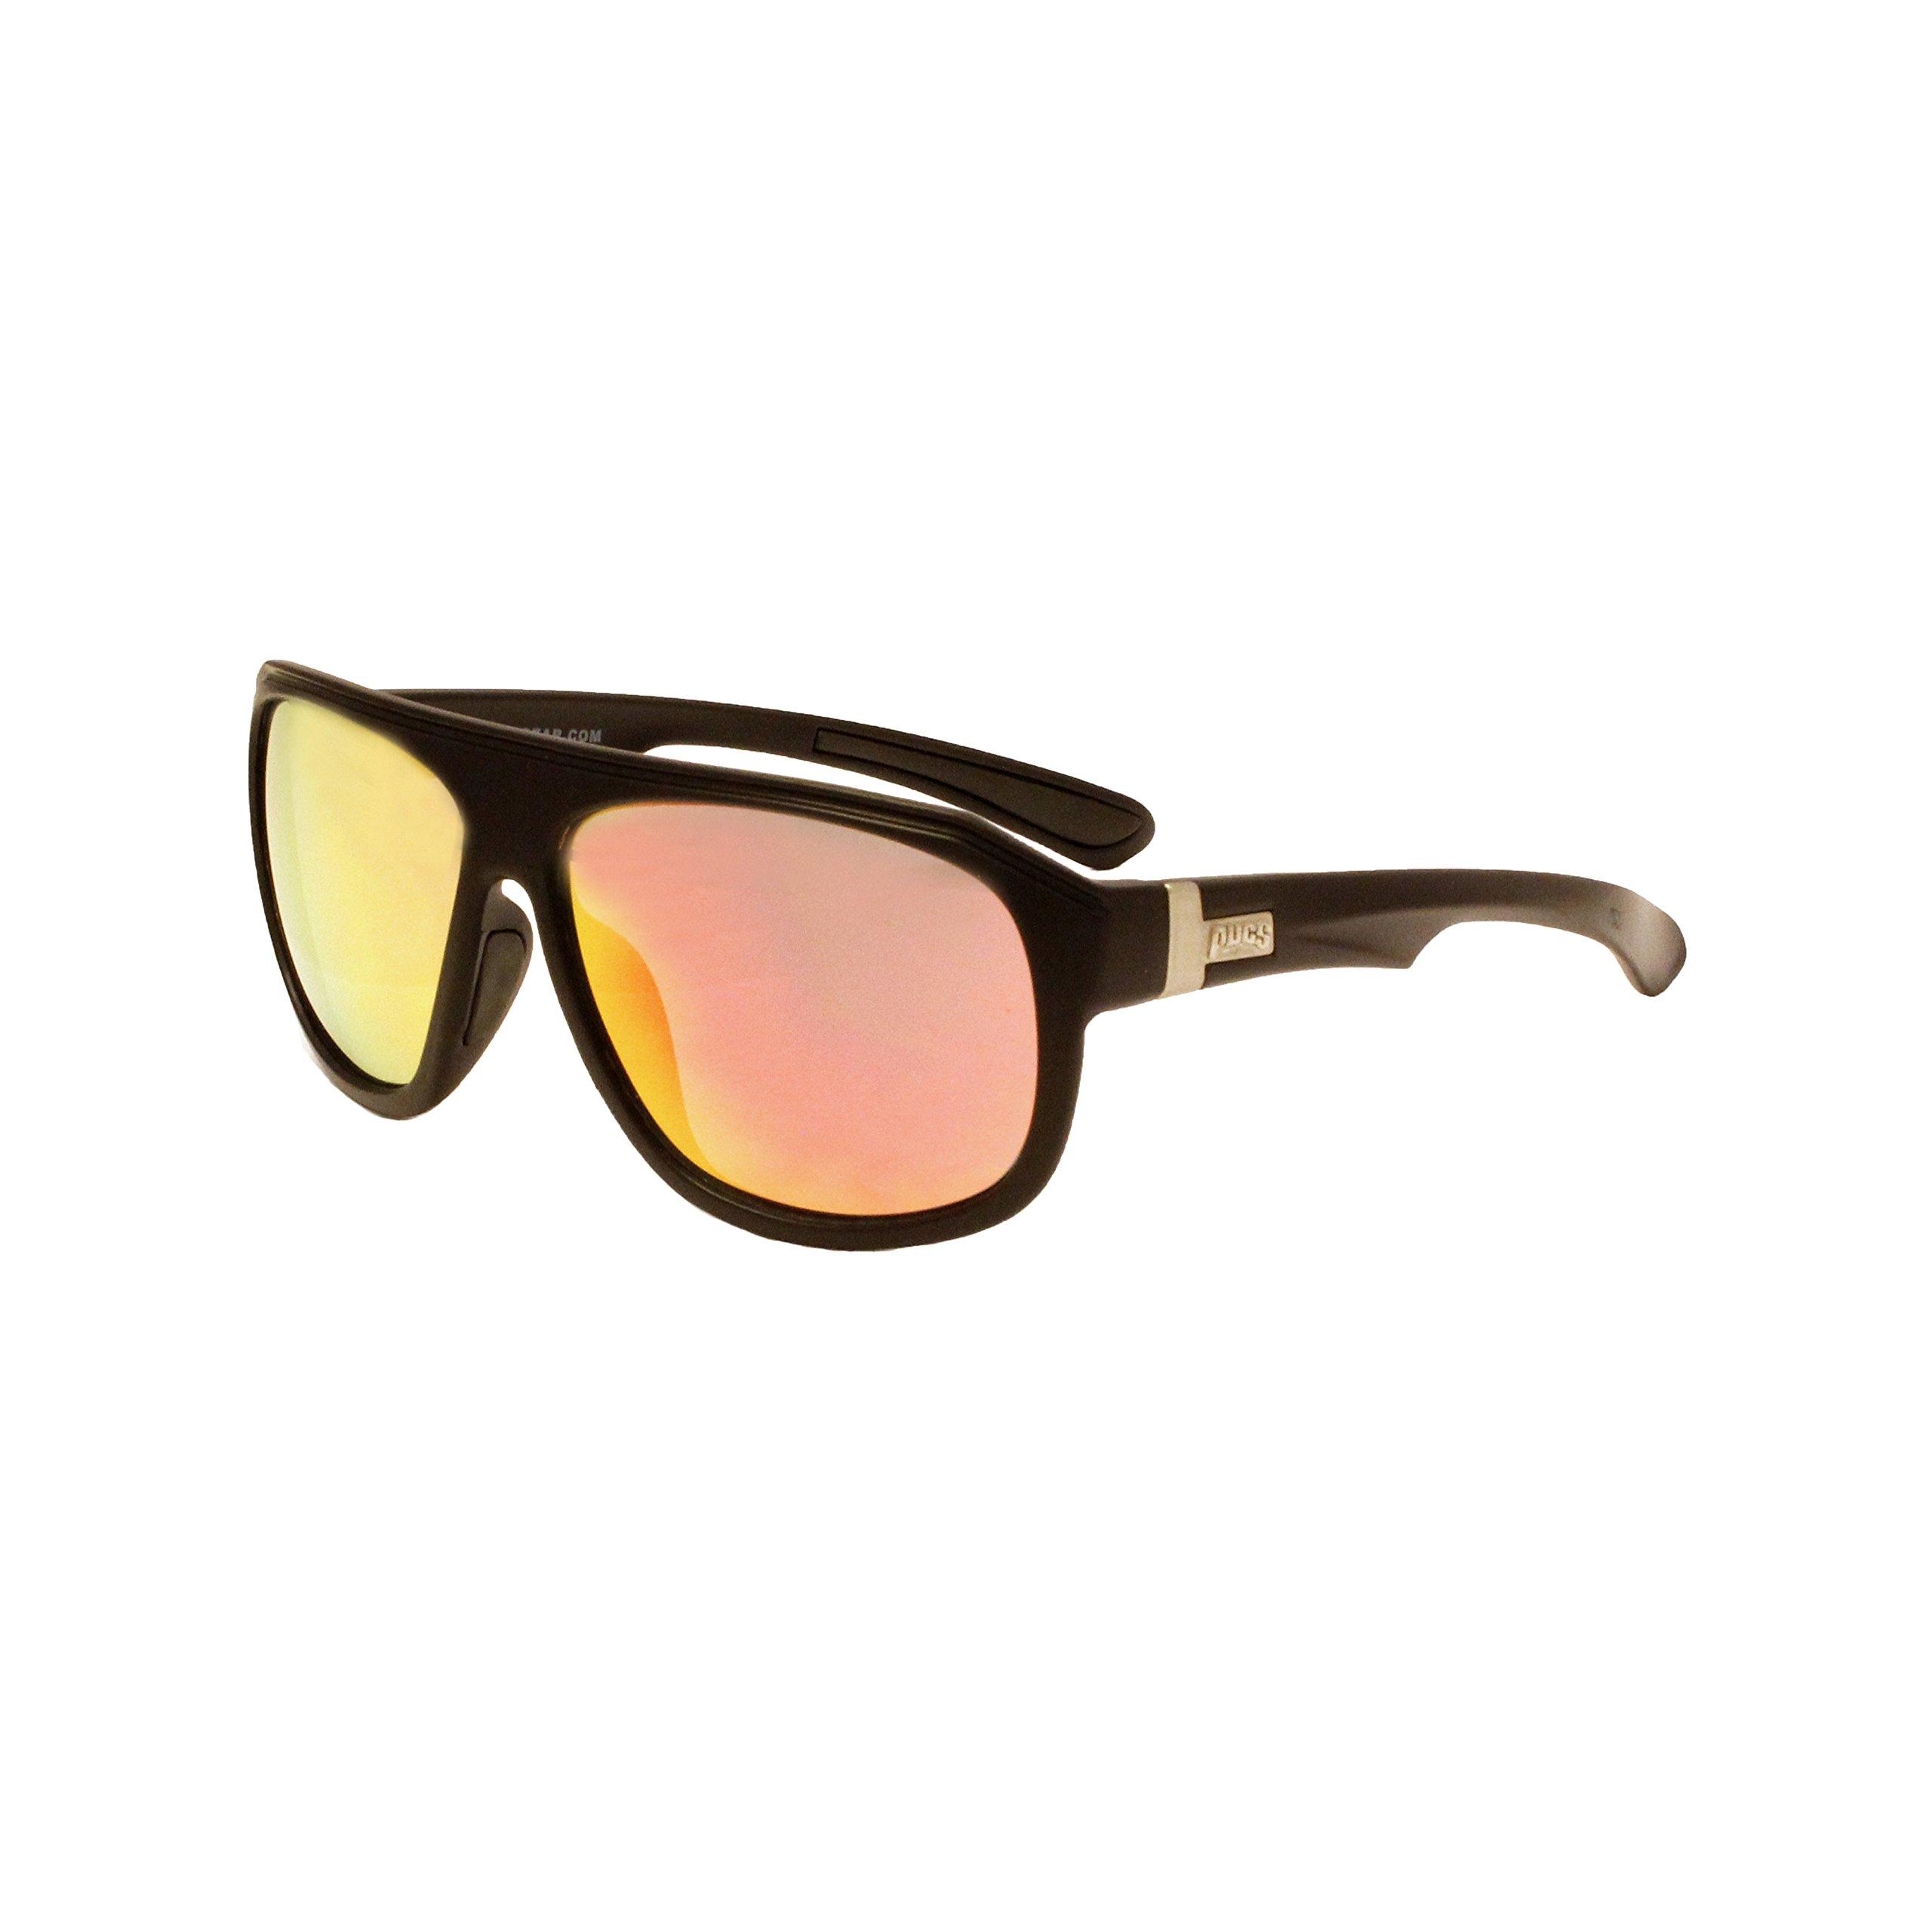 9d44f0b9e7e0d Galleon - 1403B Pugs Polarized And 100% UV Sunglasses